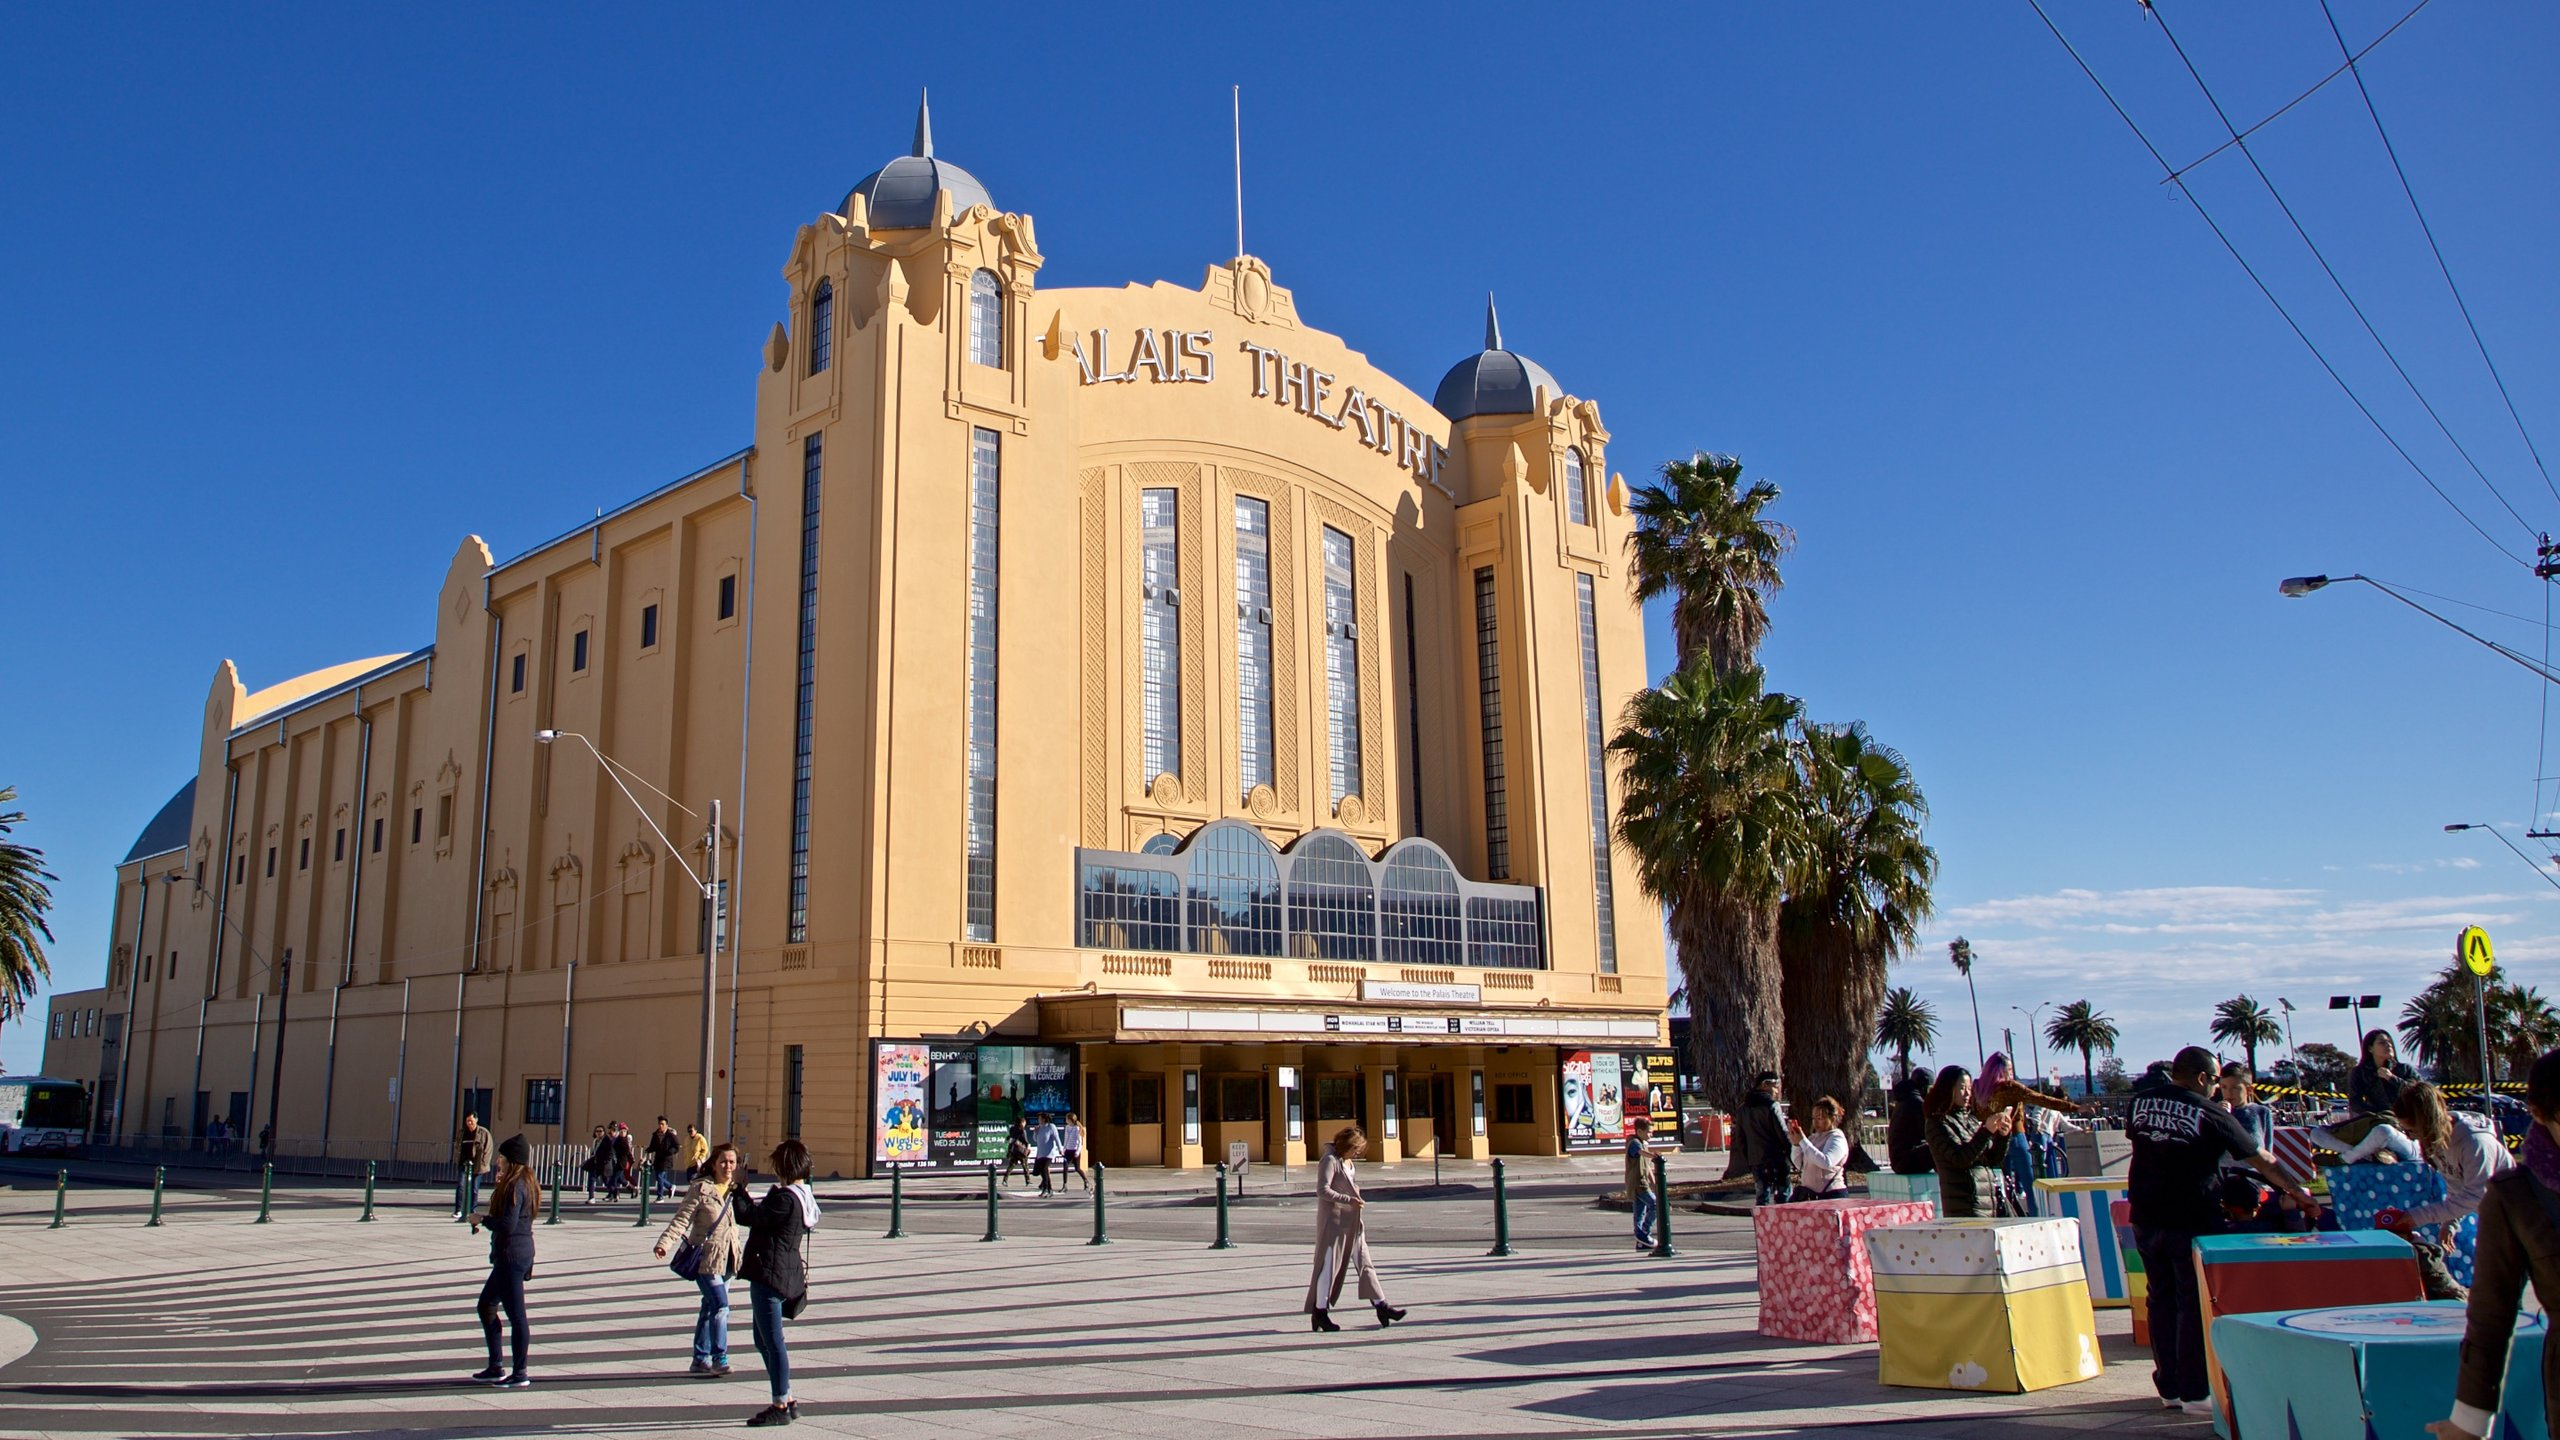 Port Phillip, Victoria, Australia